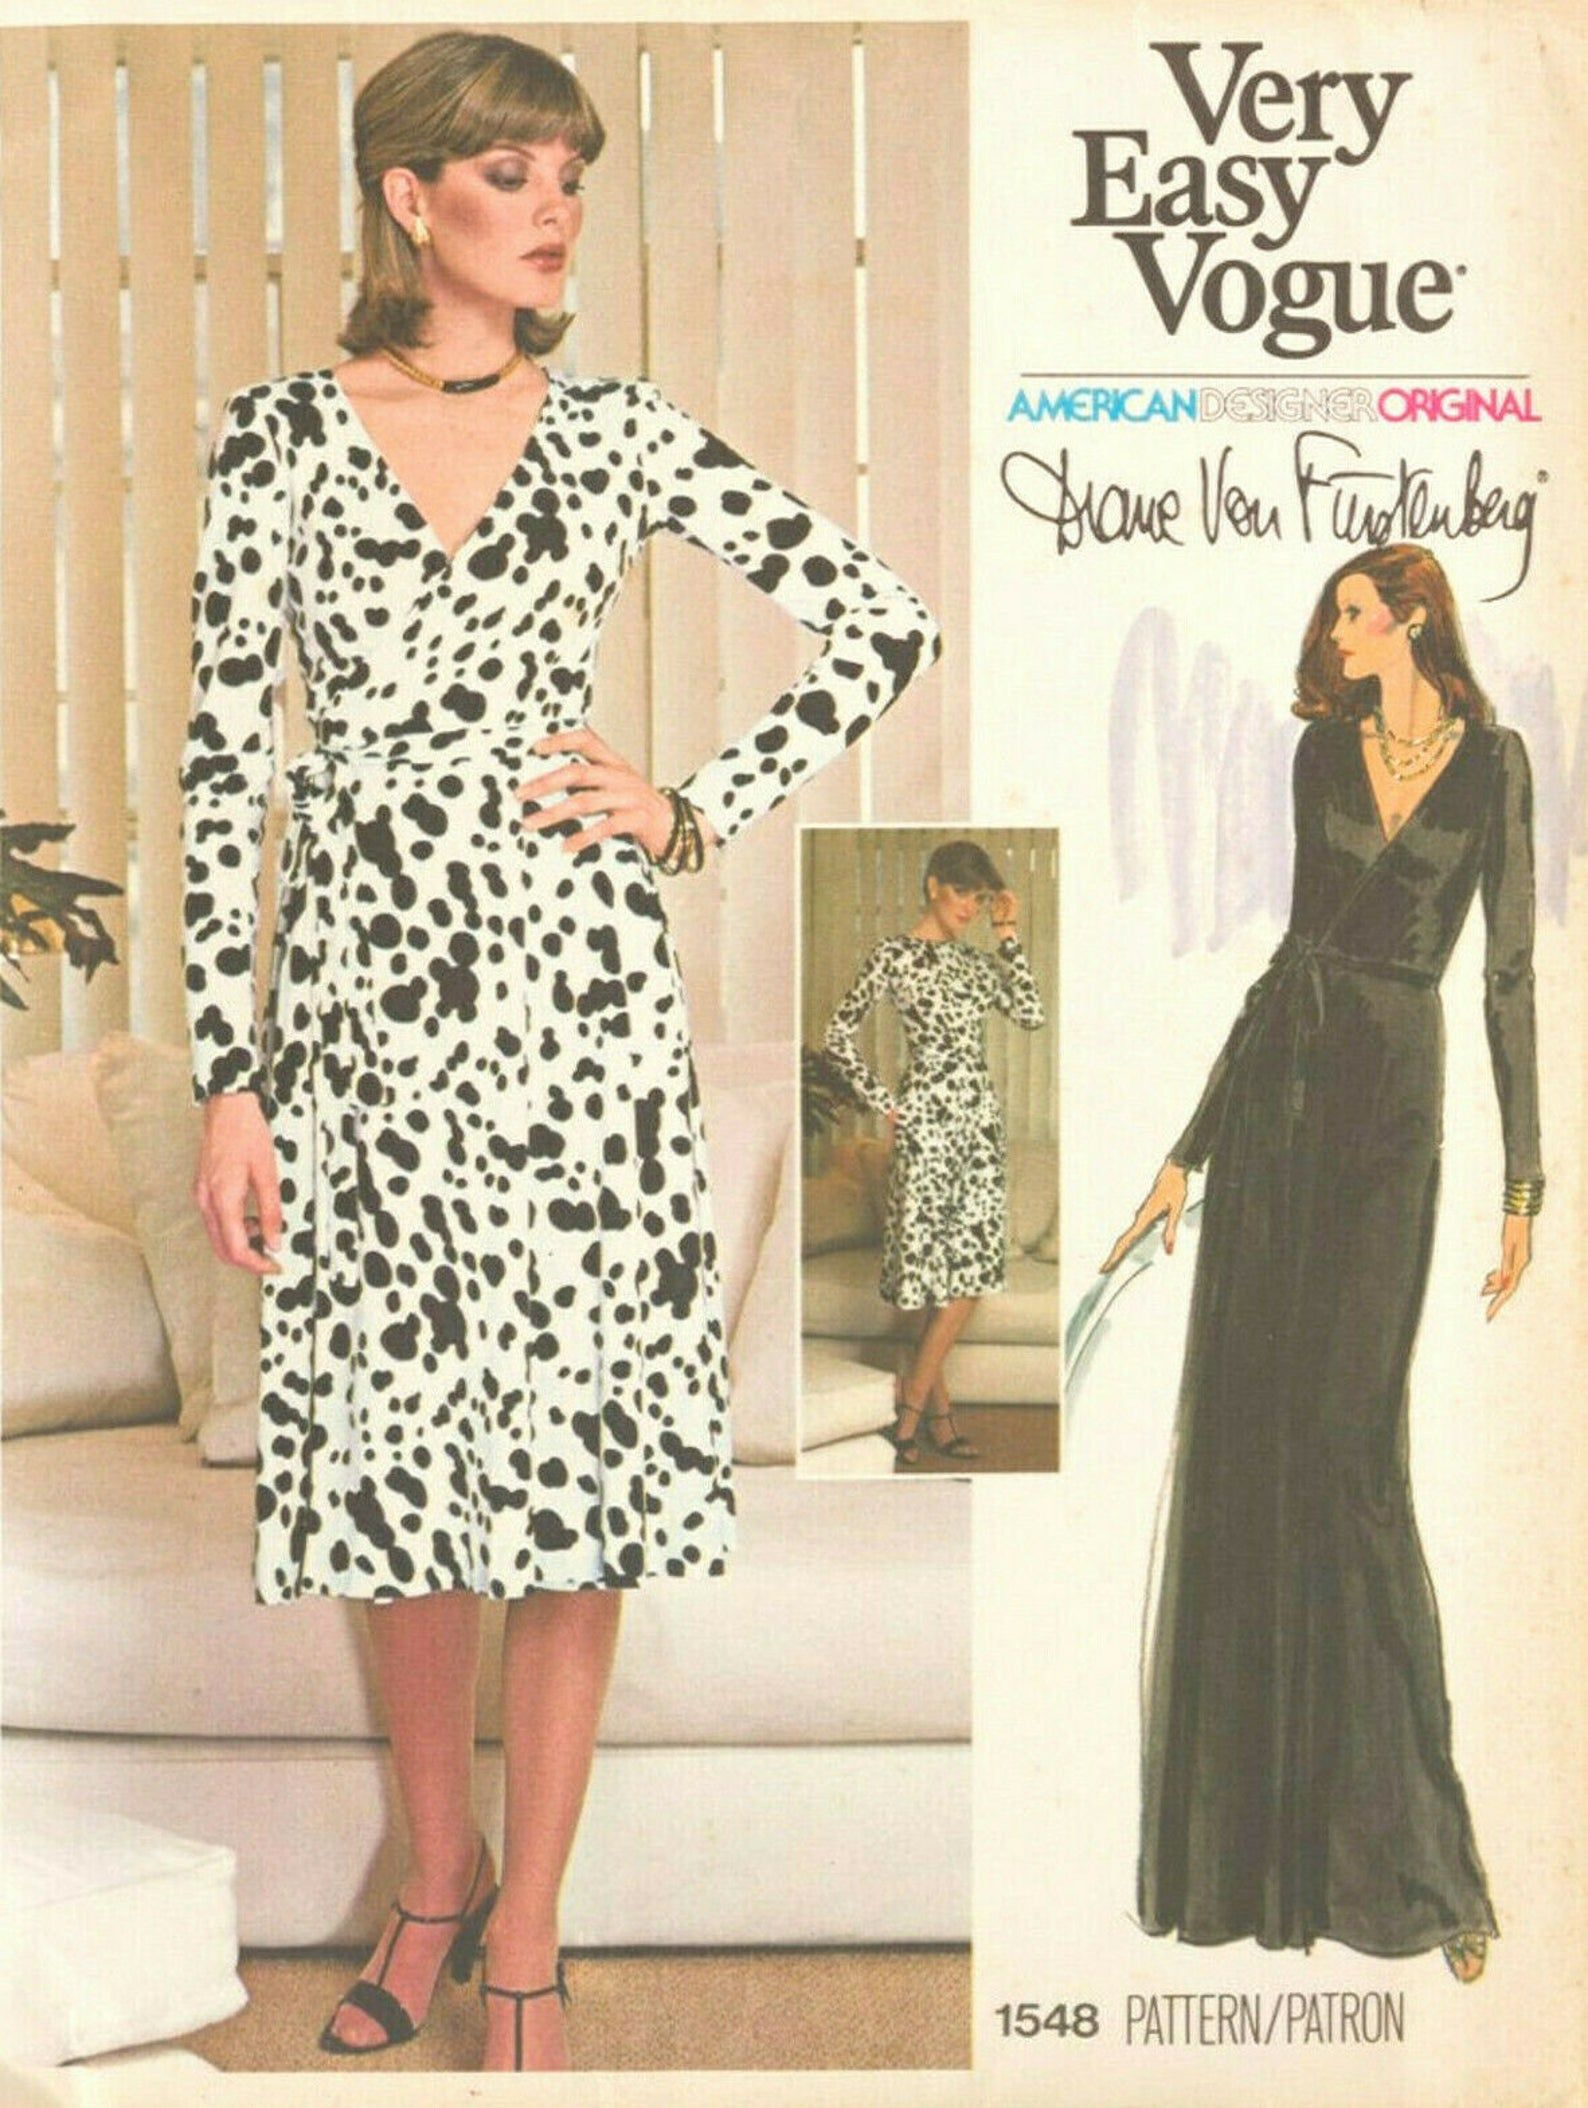 1976 Vintage Vogue Sewing Pattern Wrap Dress B38 1891 By Diane Von Furstenberg 1548 In 2021 Diane Von Furstenberg Wrap Dress Pattern Vintage Wrap Dress Diane Von Furstenberg Wrap Dress [ 2108 x 1588 Pixel ]